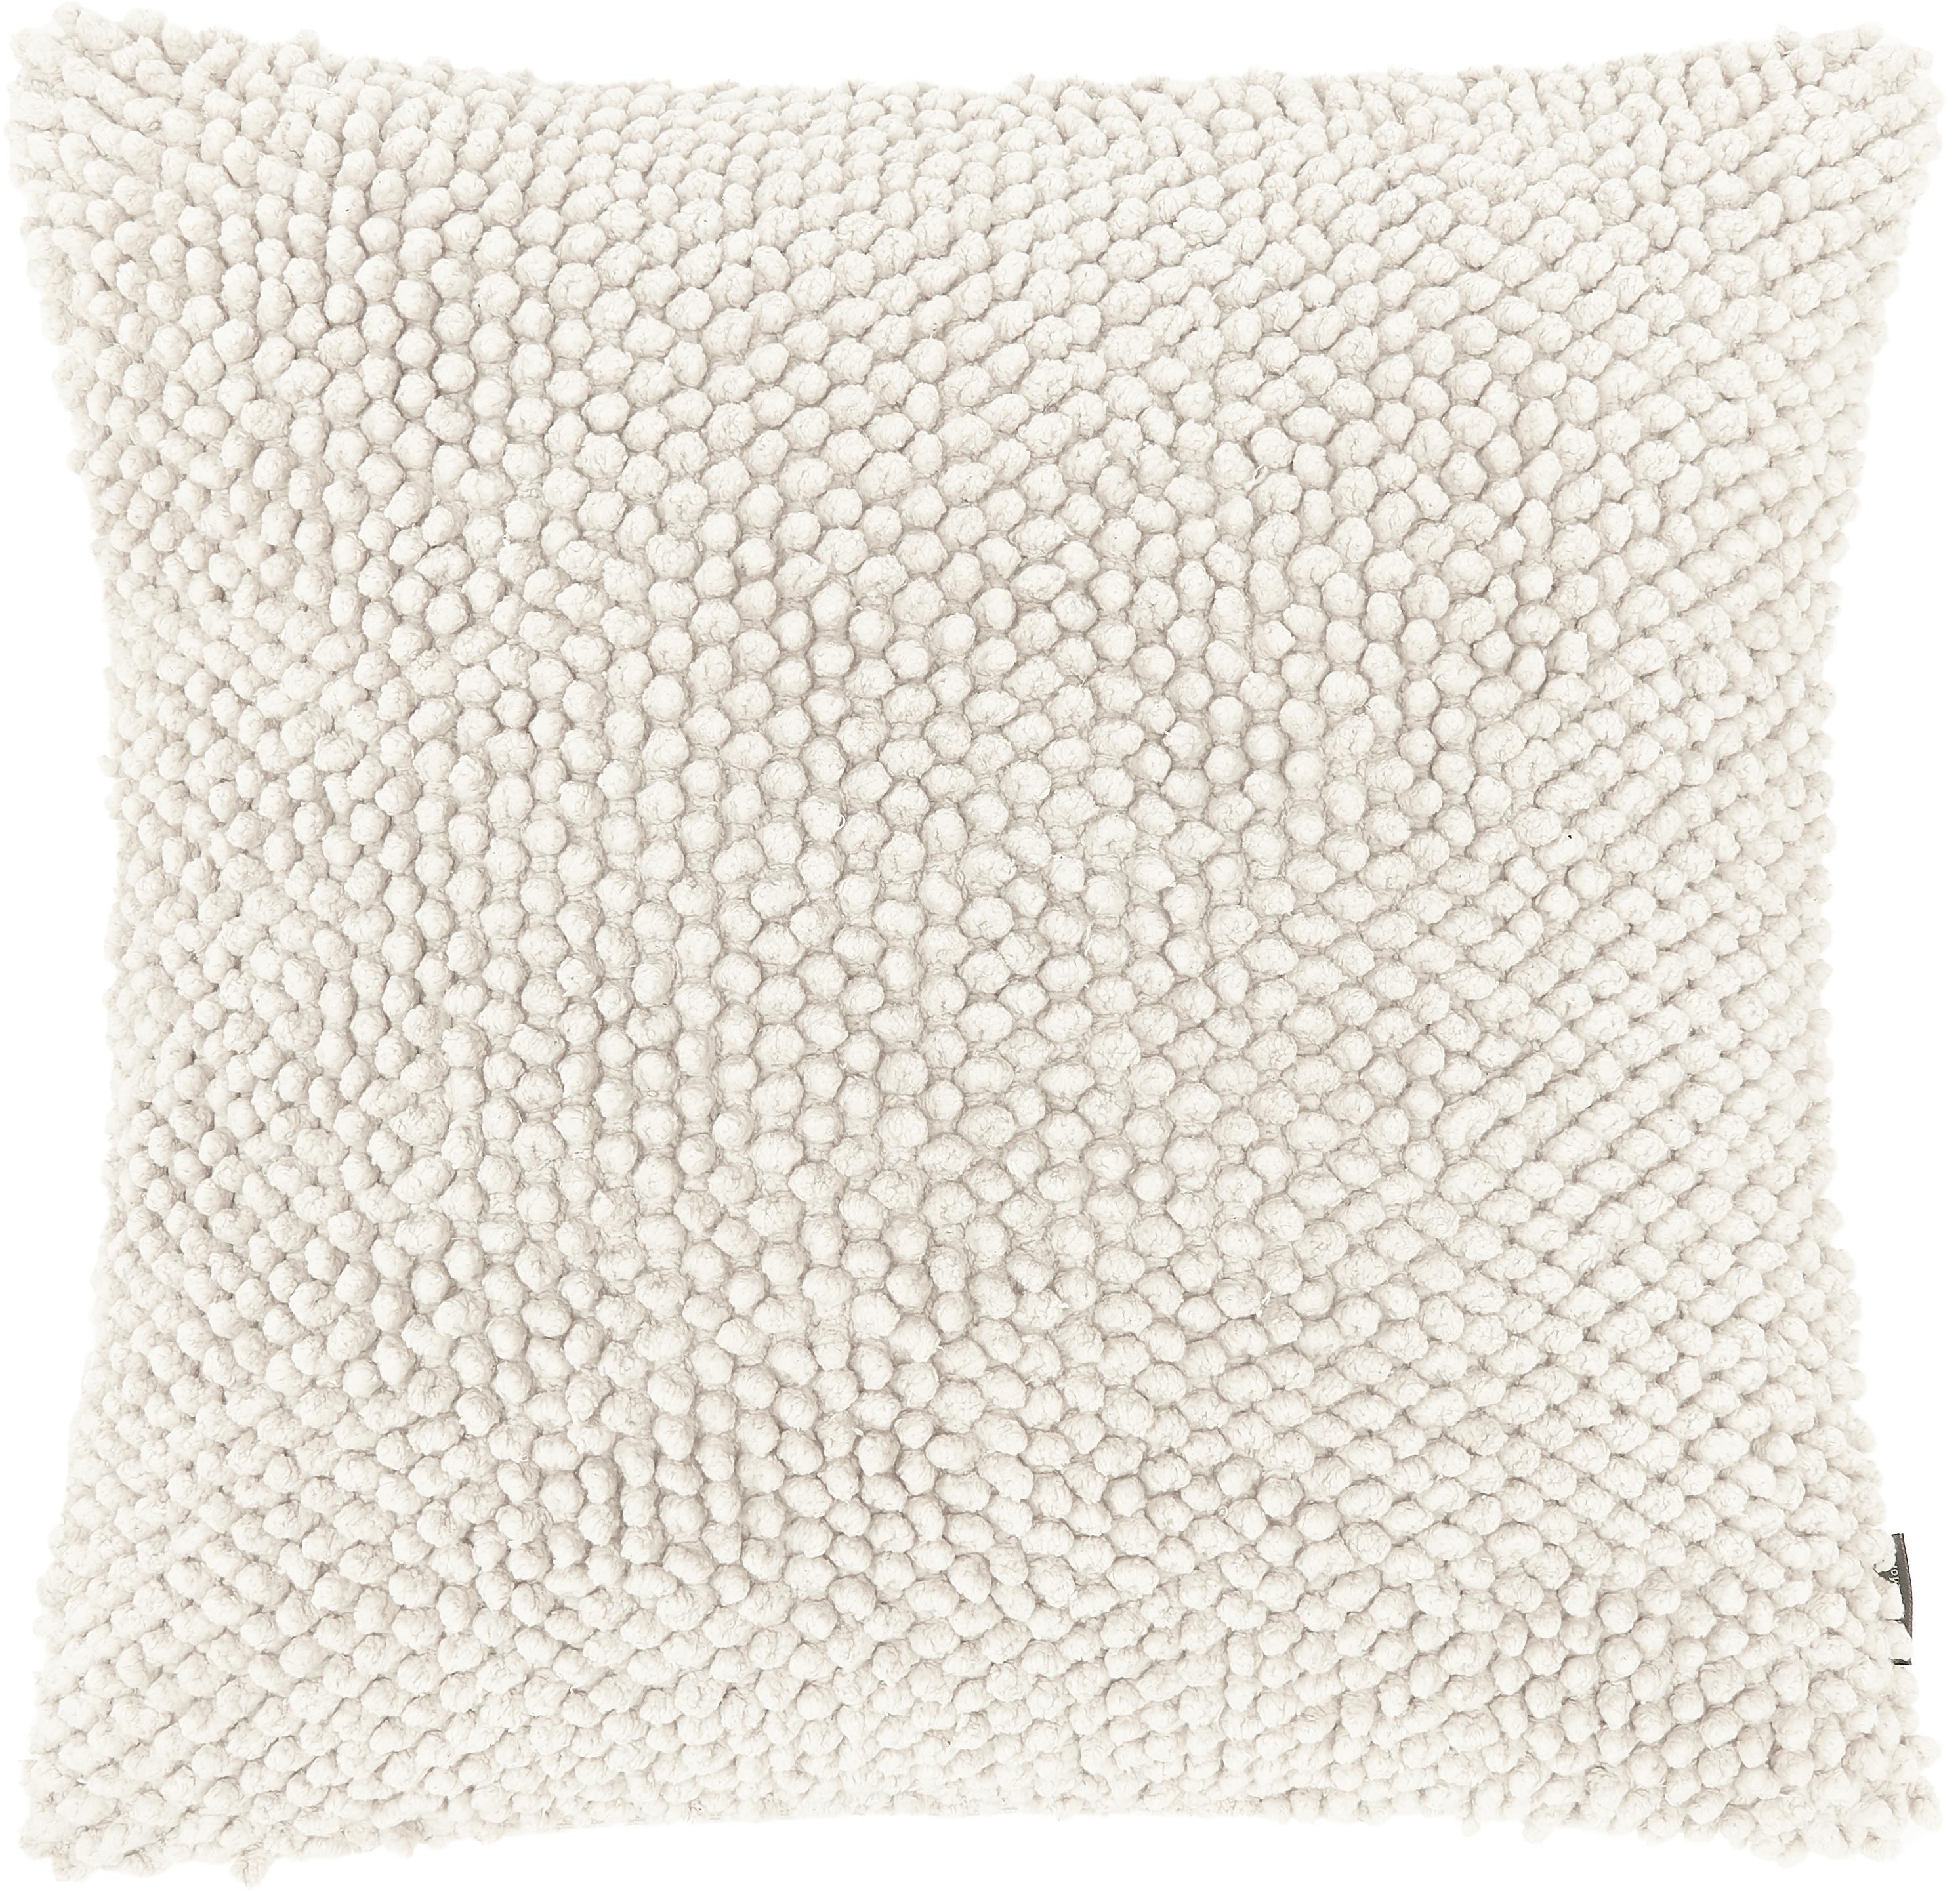 Federa arredo in cotone Indi, 100% cotone, Bianco latteo, Larg. 45 x Lung. 45 cm